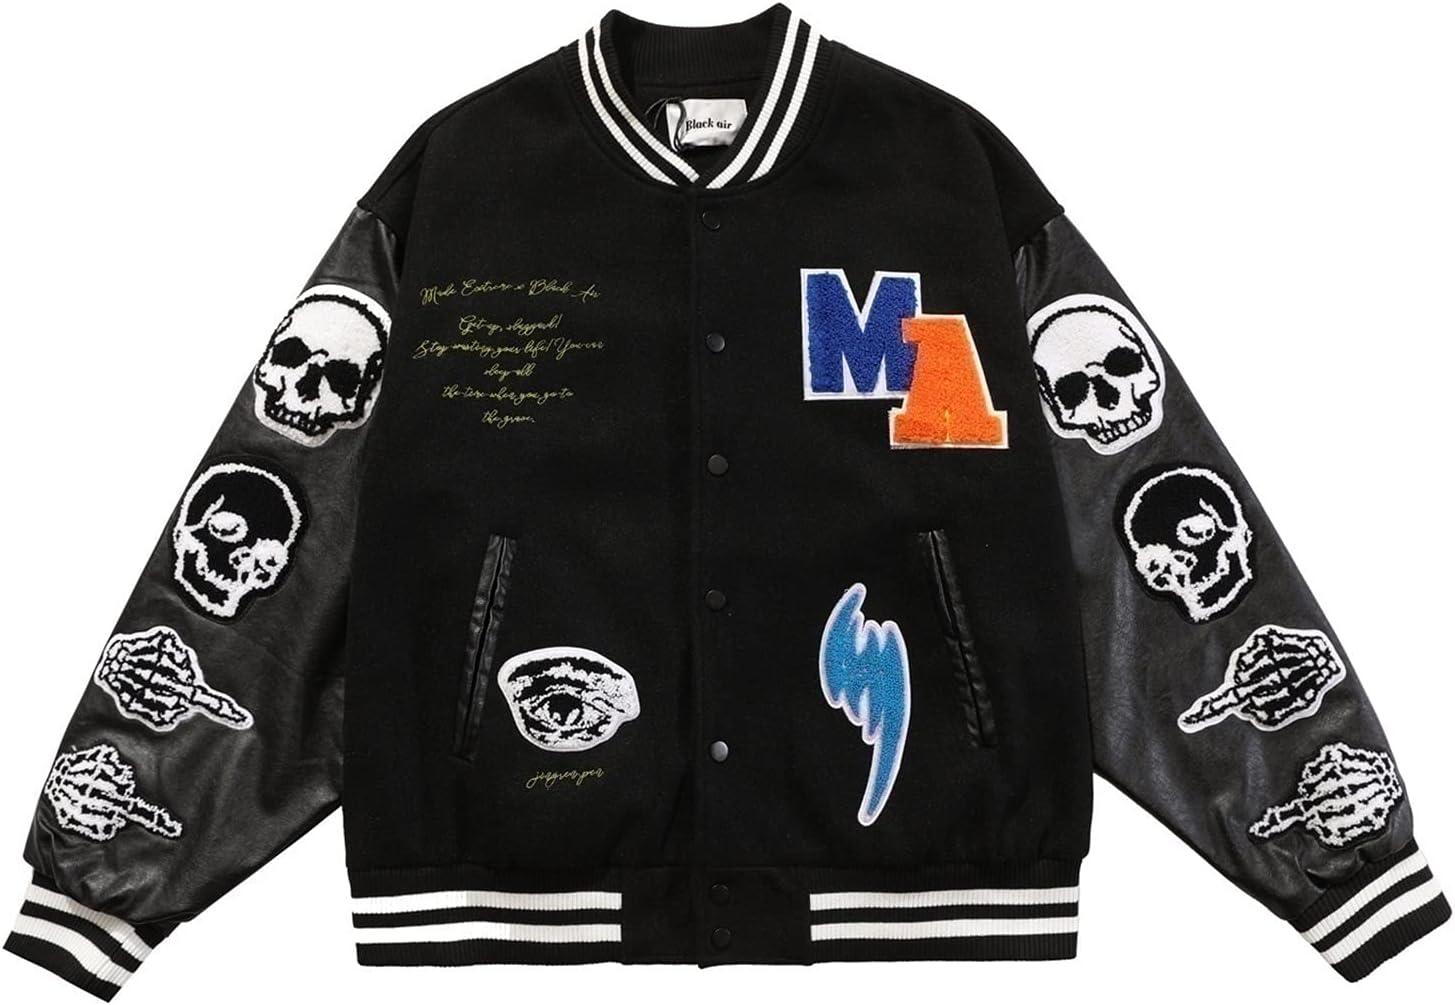 CRGSM Jackets Men Jackets College Cargo Winter Parka Jacket Baseball Sports Jacket Sweat Jacket Unisex Patchwork Hoodies Fashion Streetwear (Color : Black, Size : XX-Large)